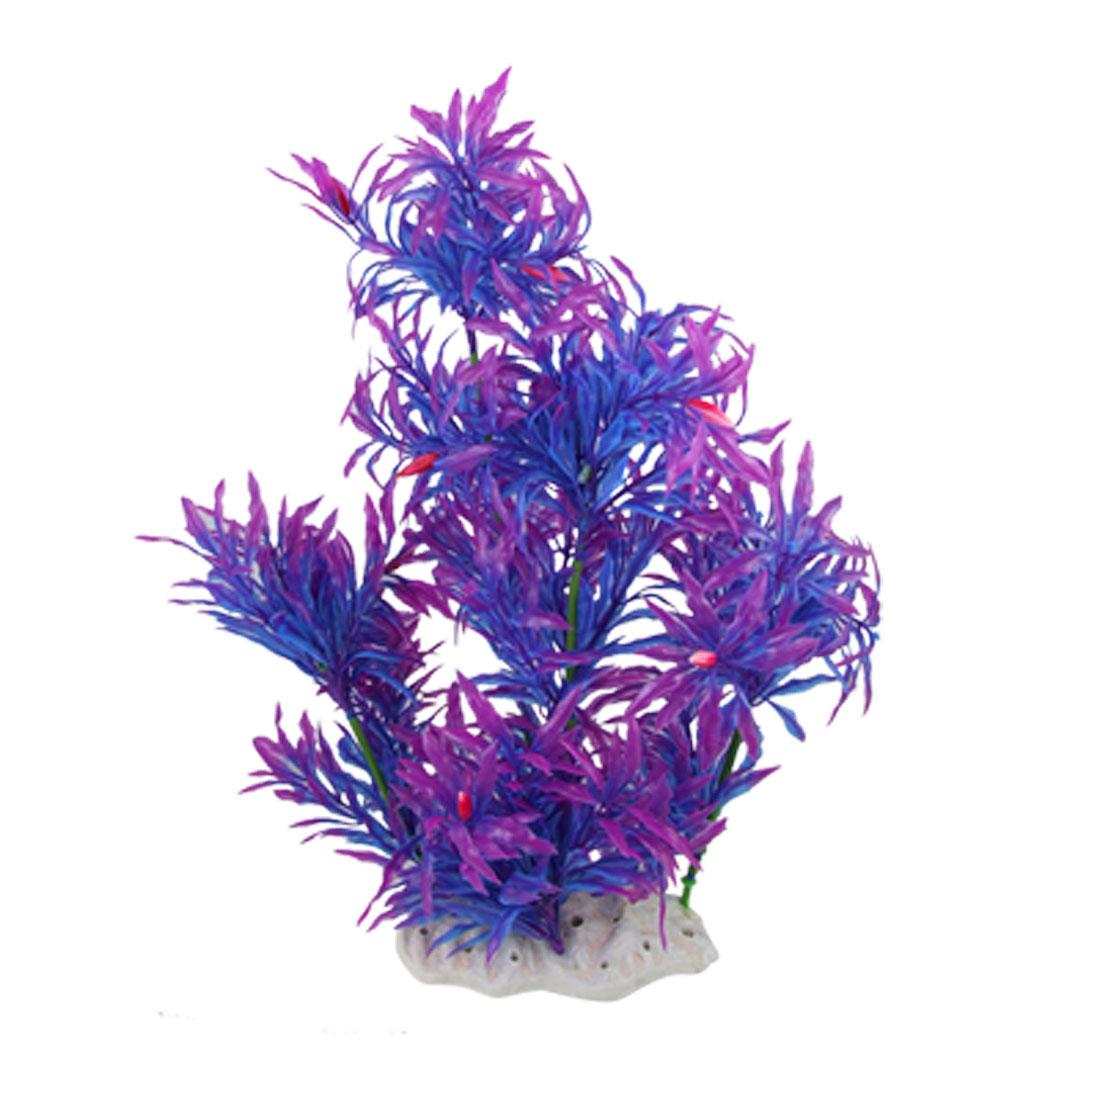 Aquriumm Ornament Purple Blue Leaves 36cm High Plastic Plant